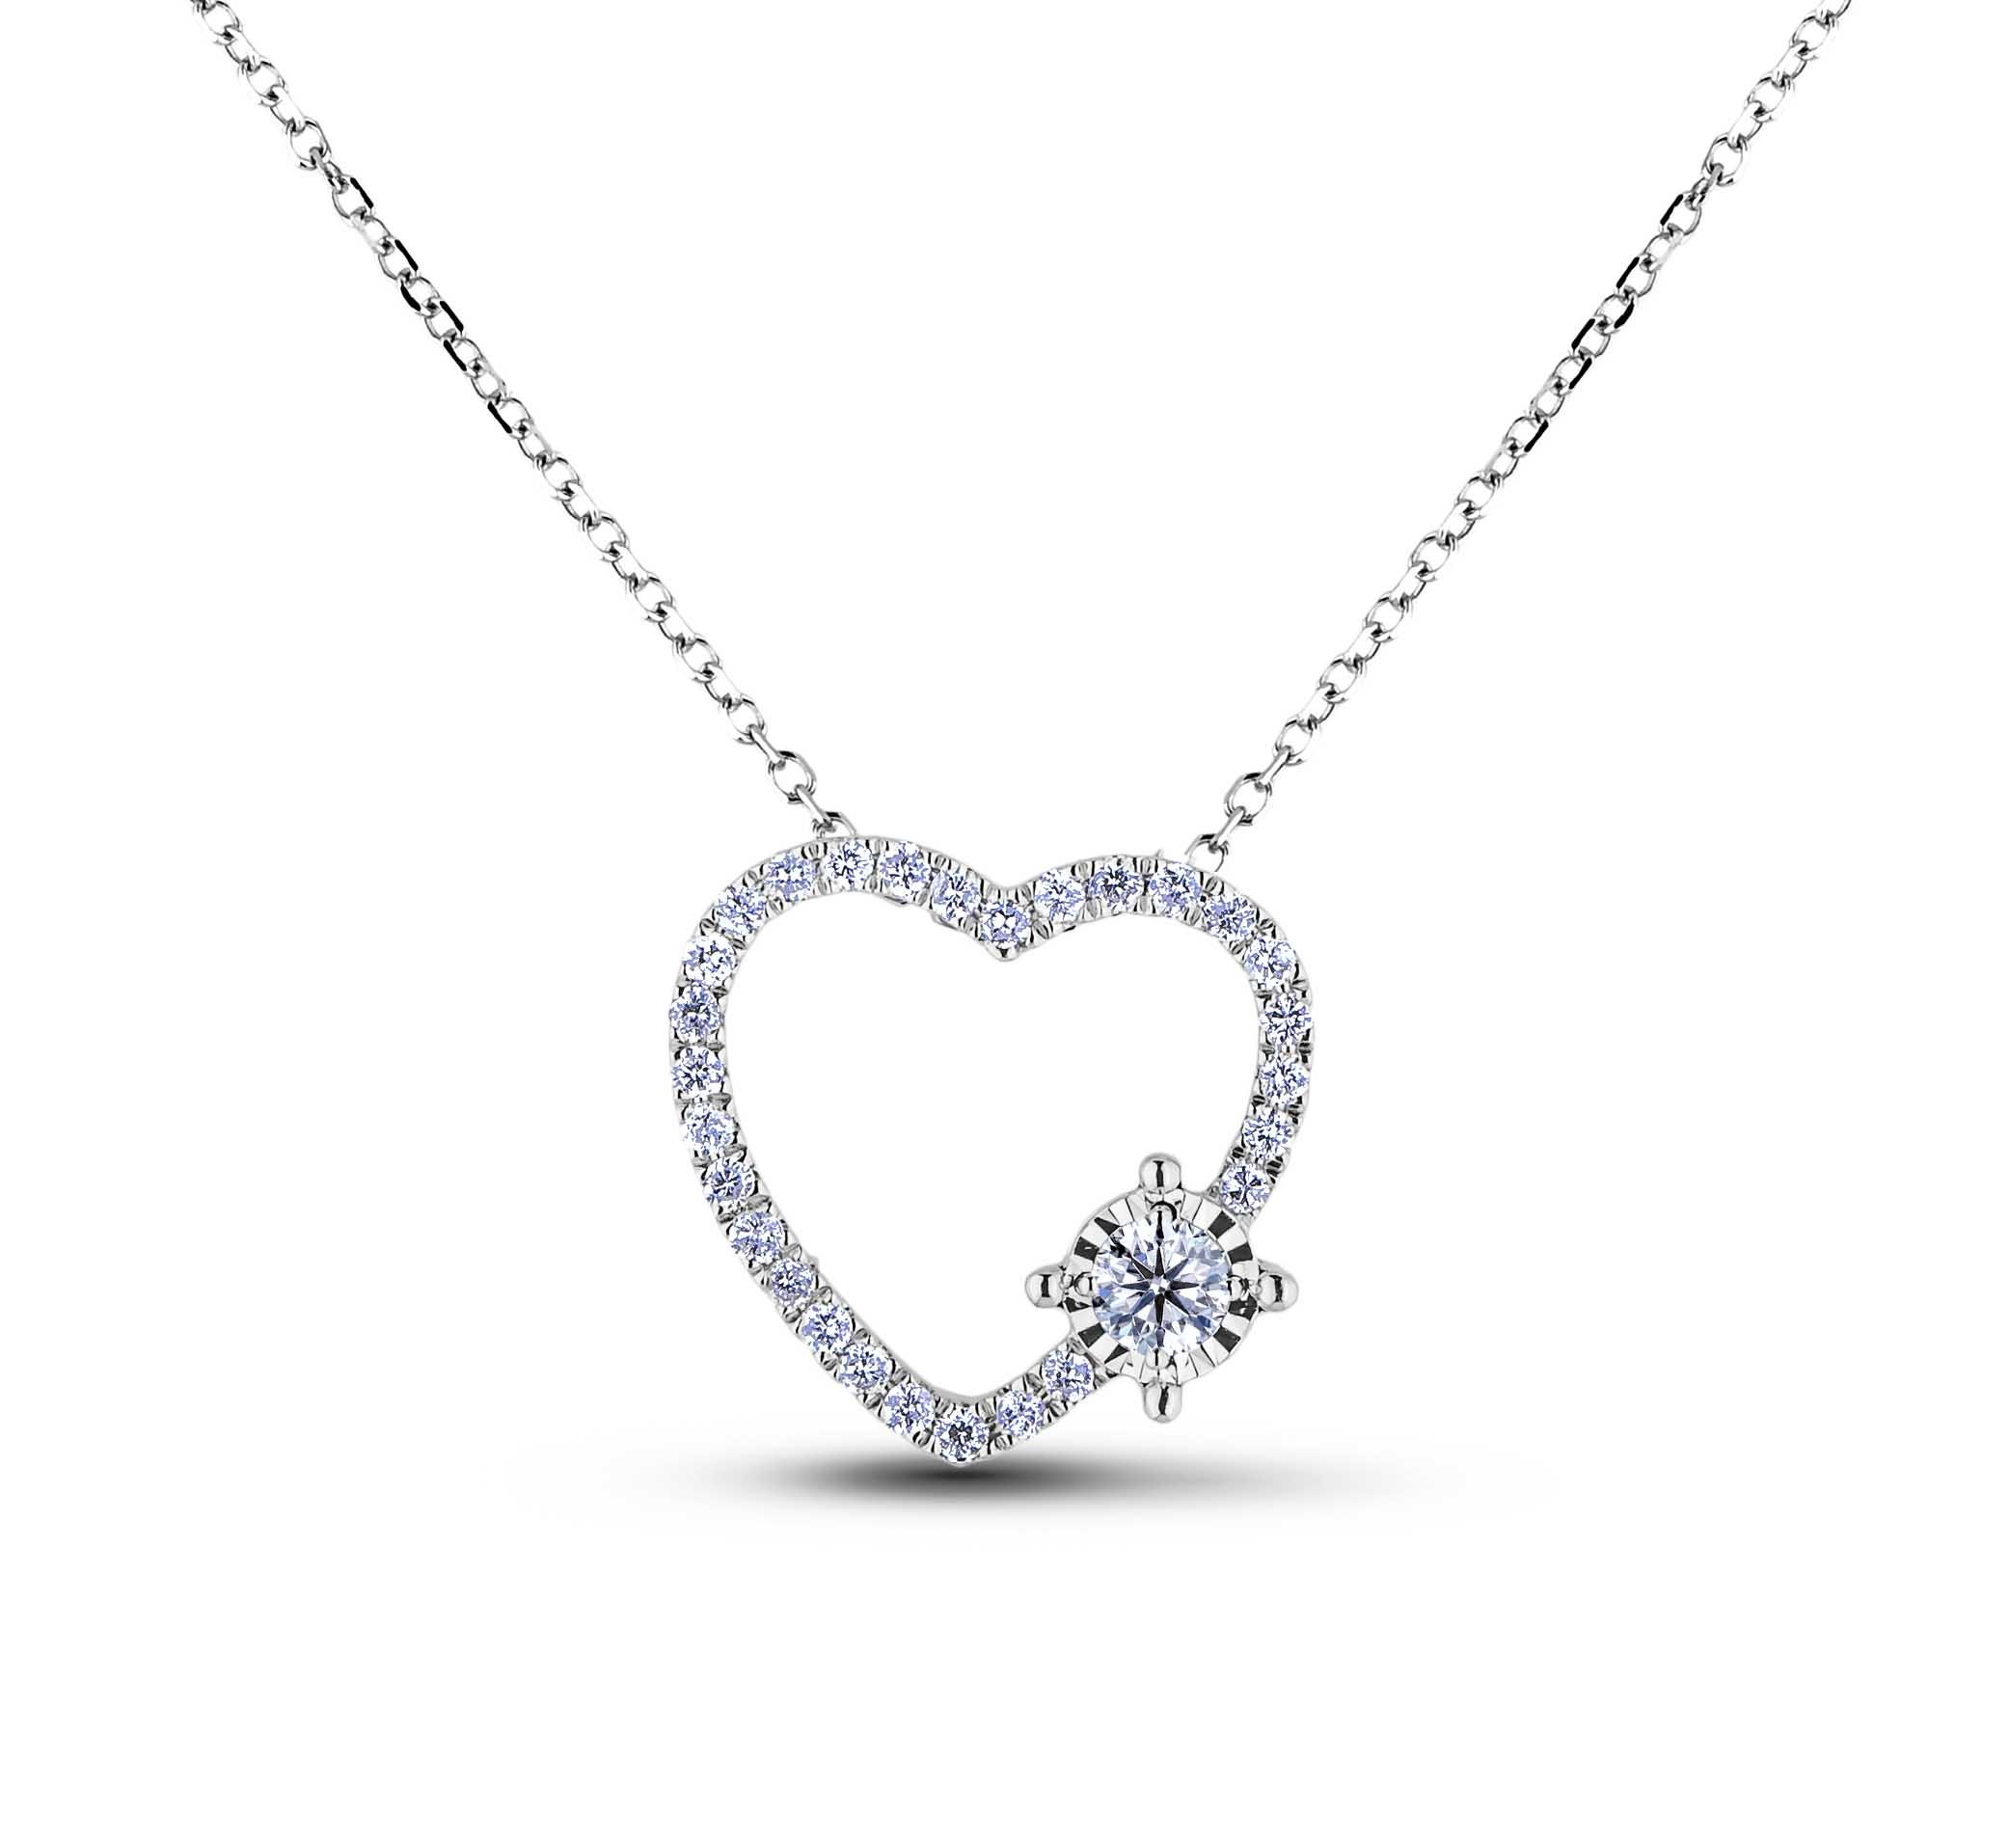 Diamond Pendants AFCP1336010 (Pendants)